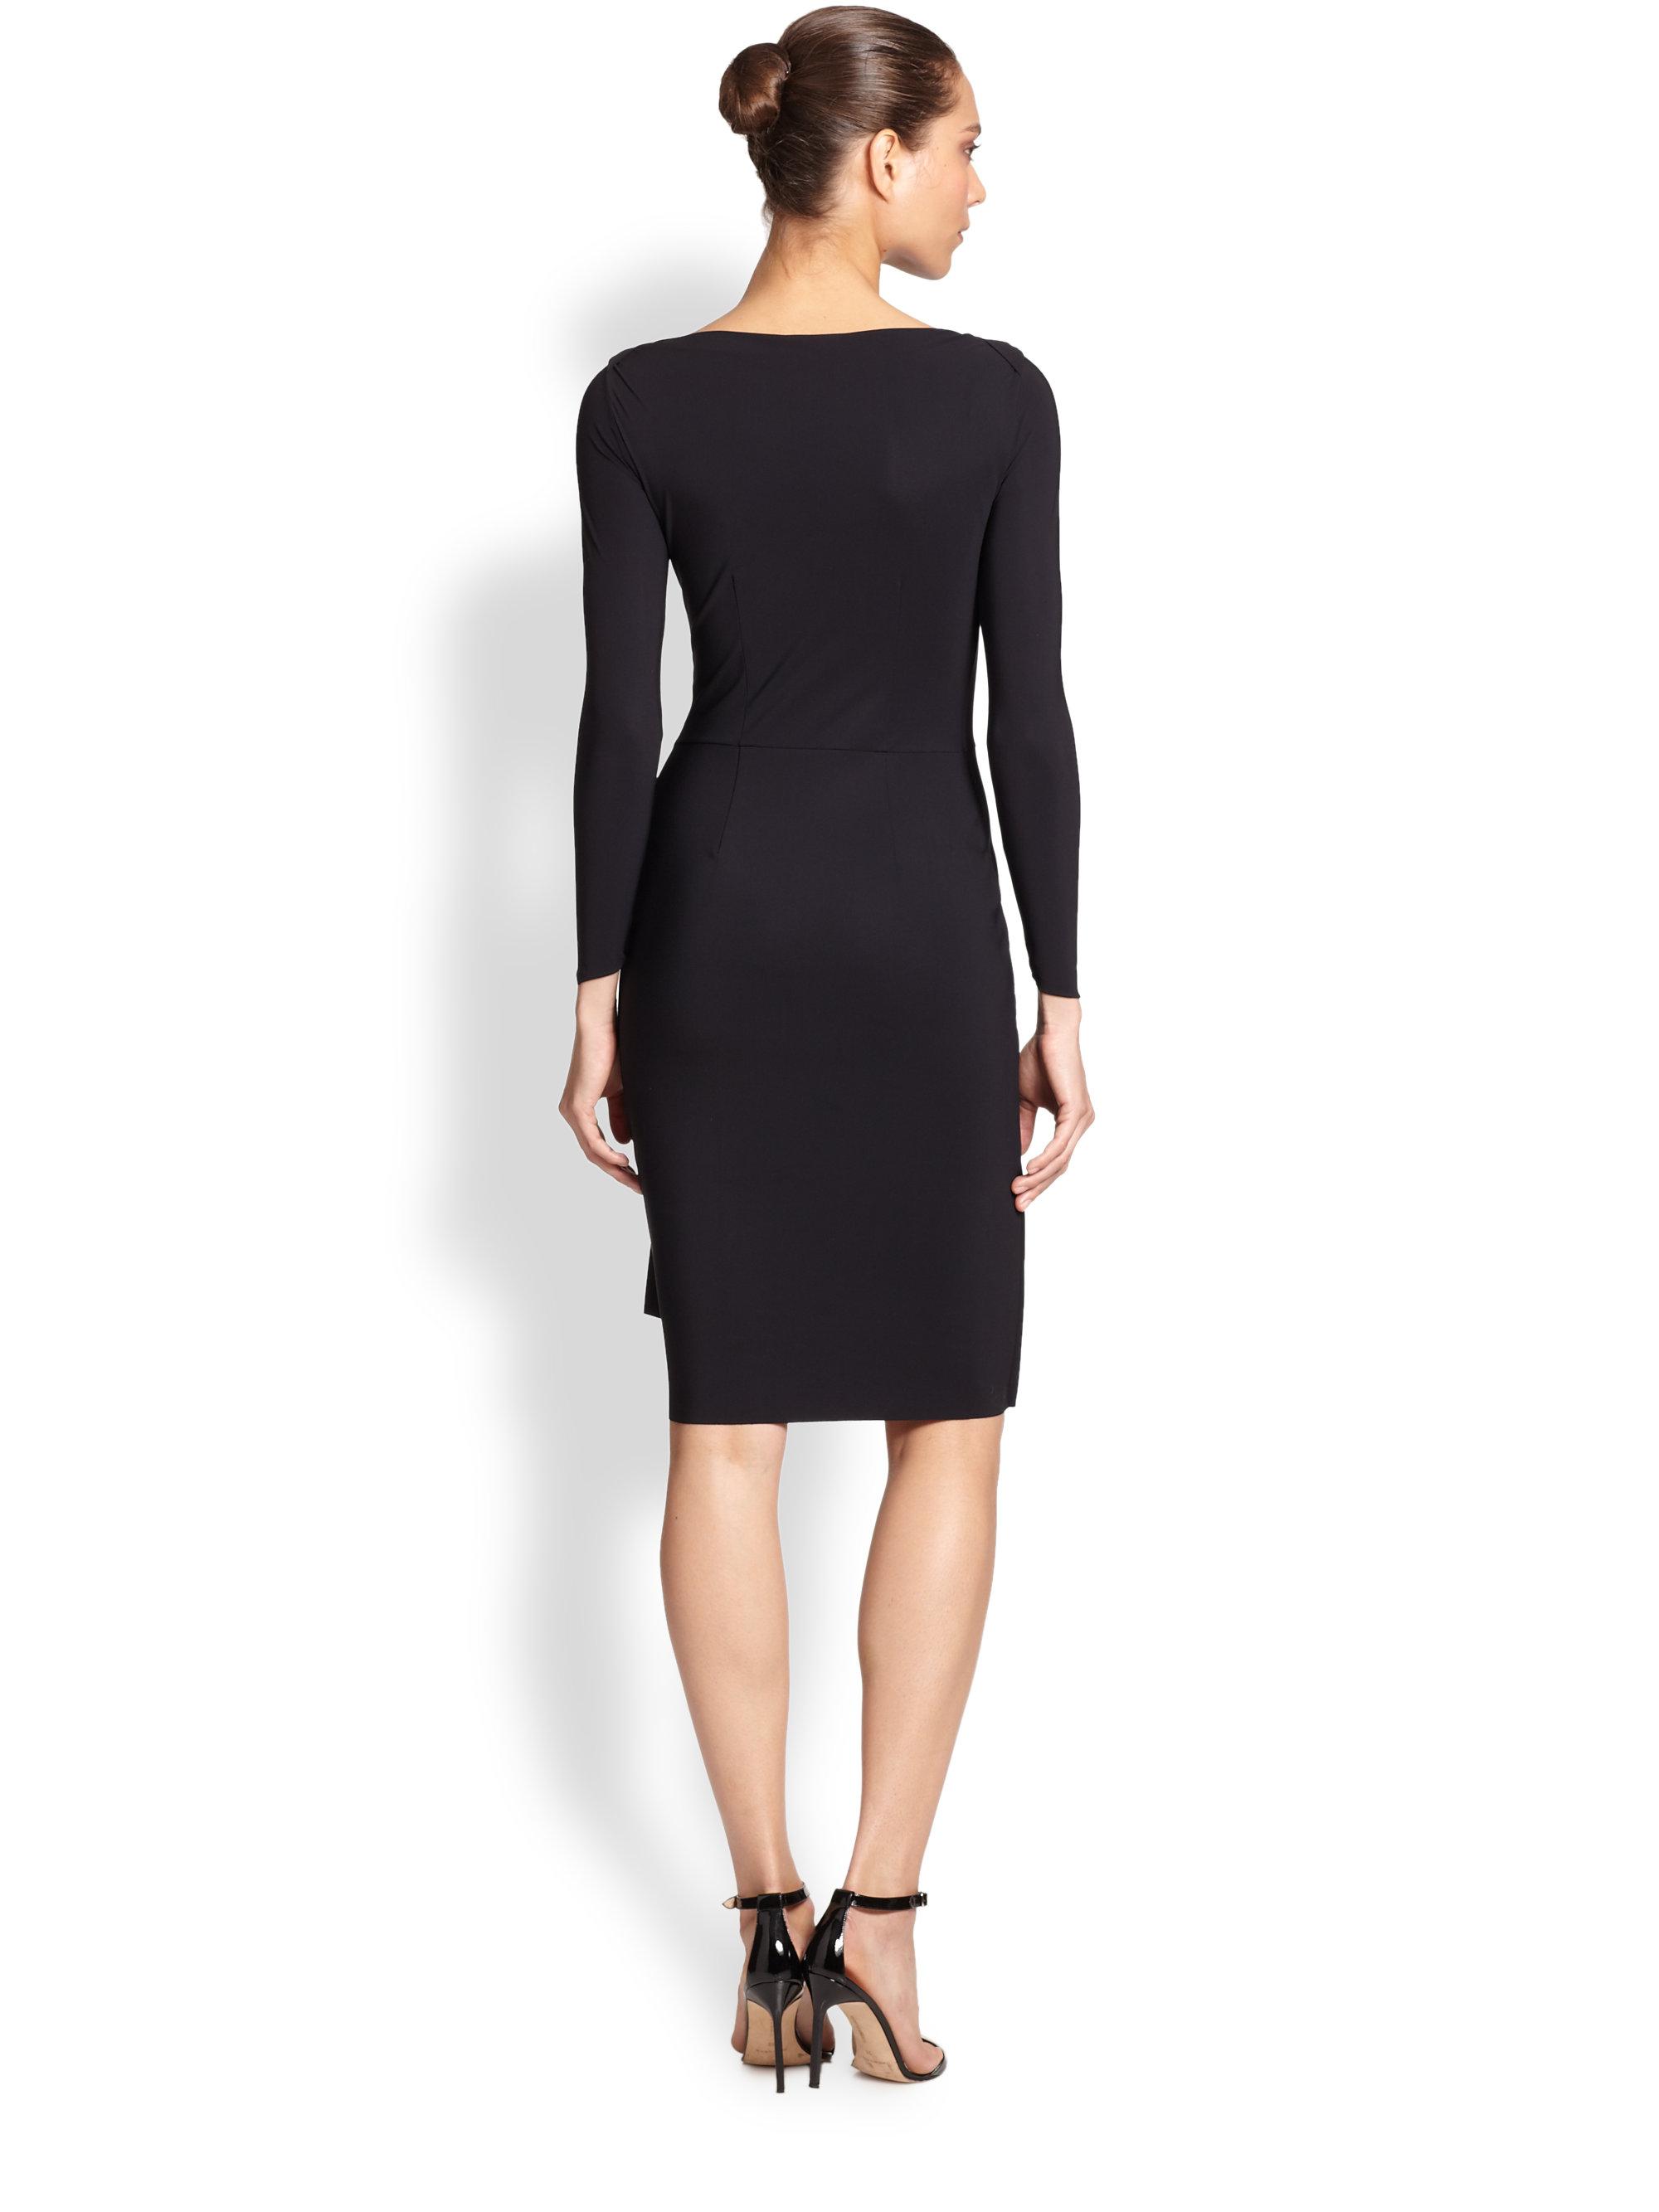 La Petite Robe Di Chiara Boni Long Sleeve Cocktail Dress